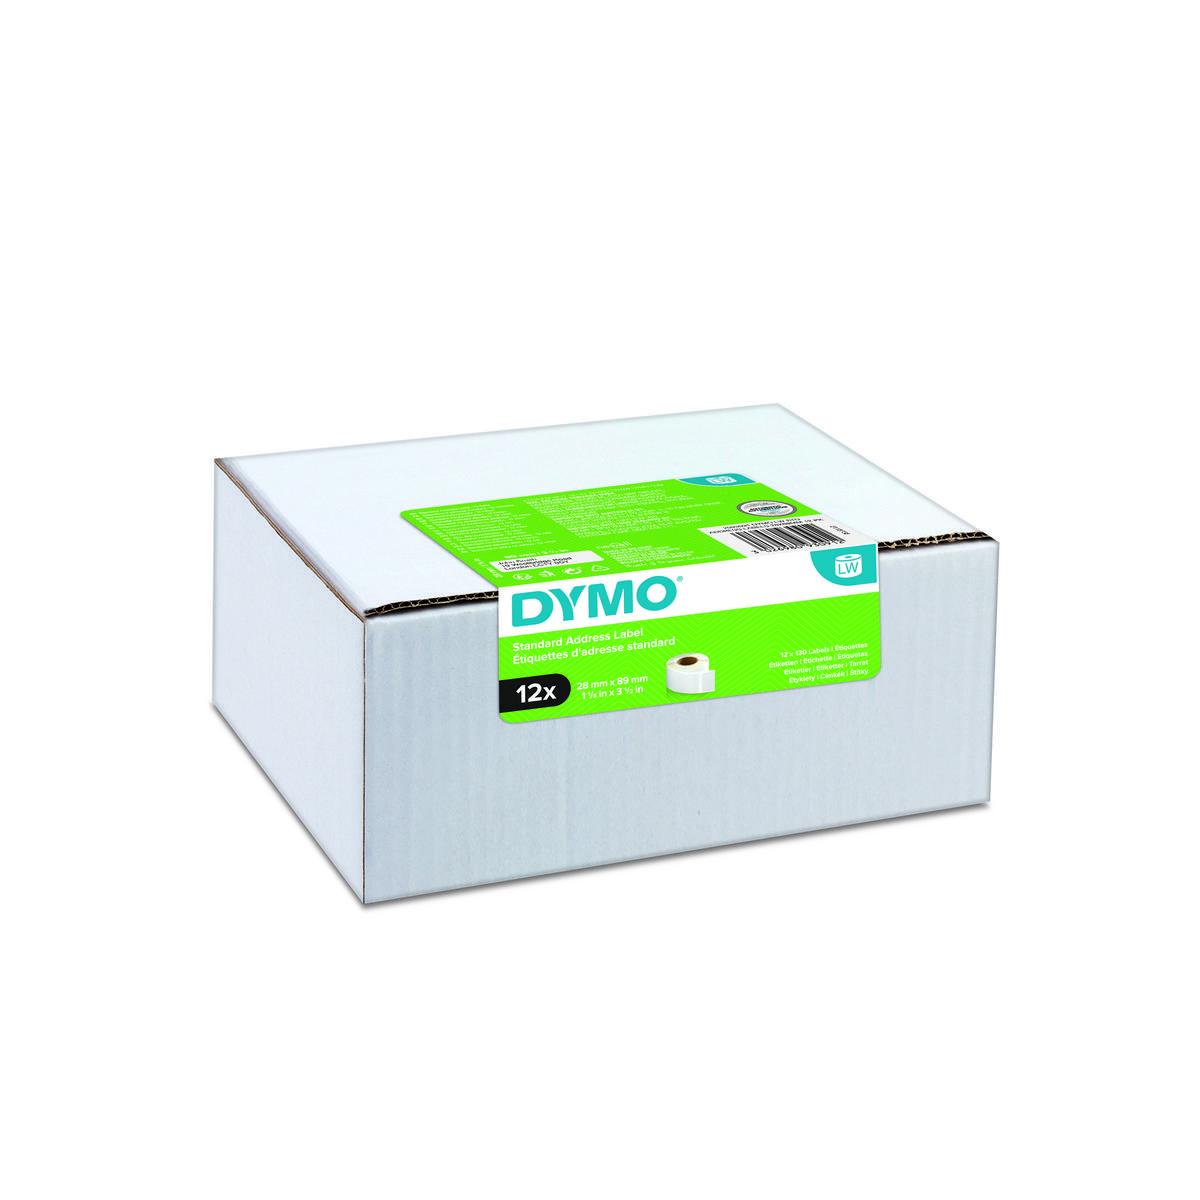 Dymo 2093091 - 89 x 28mm - wit papieren labels - 12 rollen